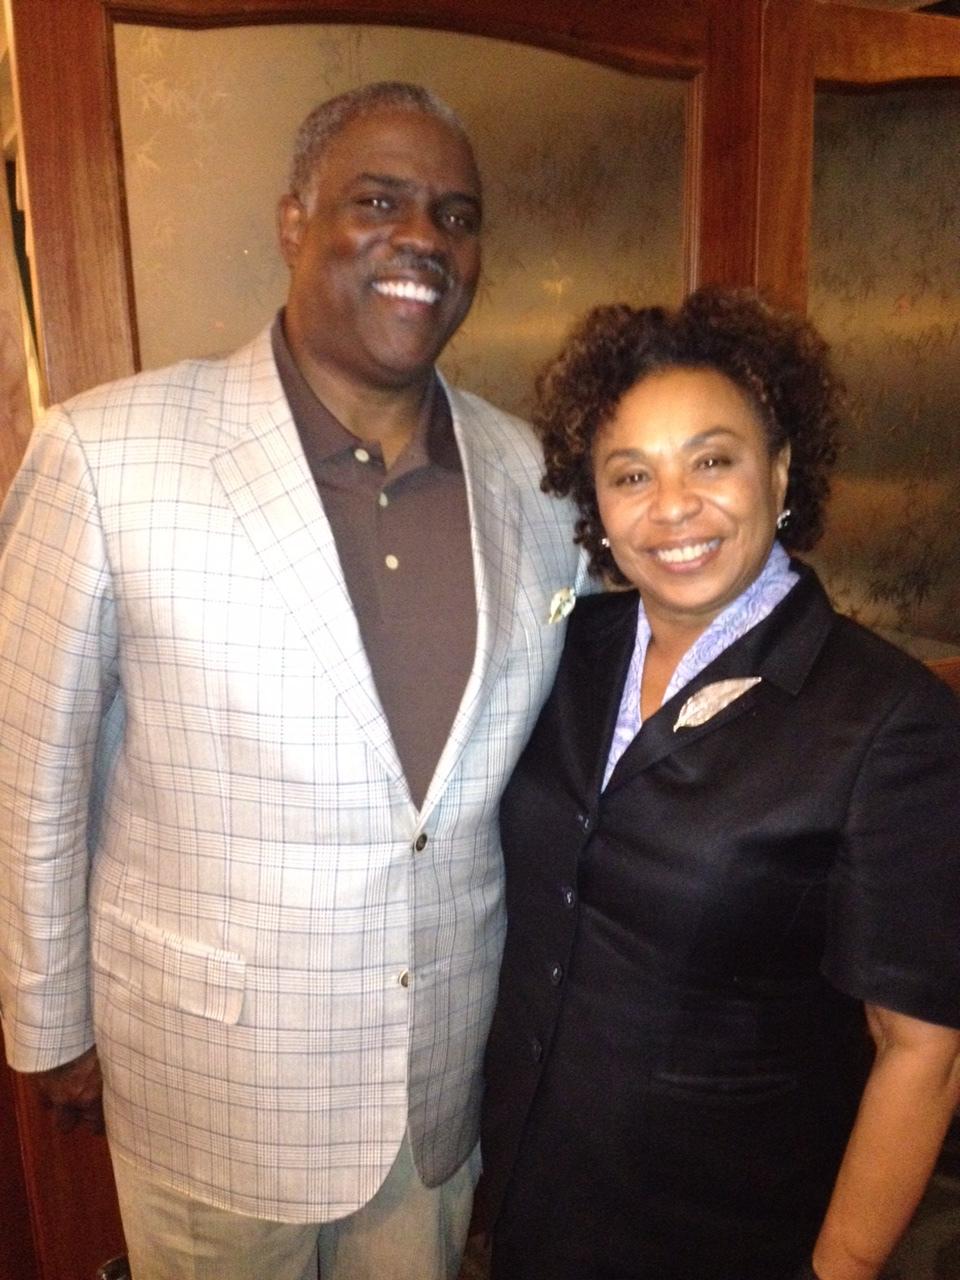 Professor Mark T. Harris, Esq. with the Honorable United States Reprasenative Barbara Lee